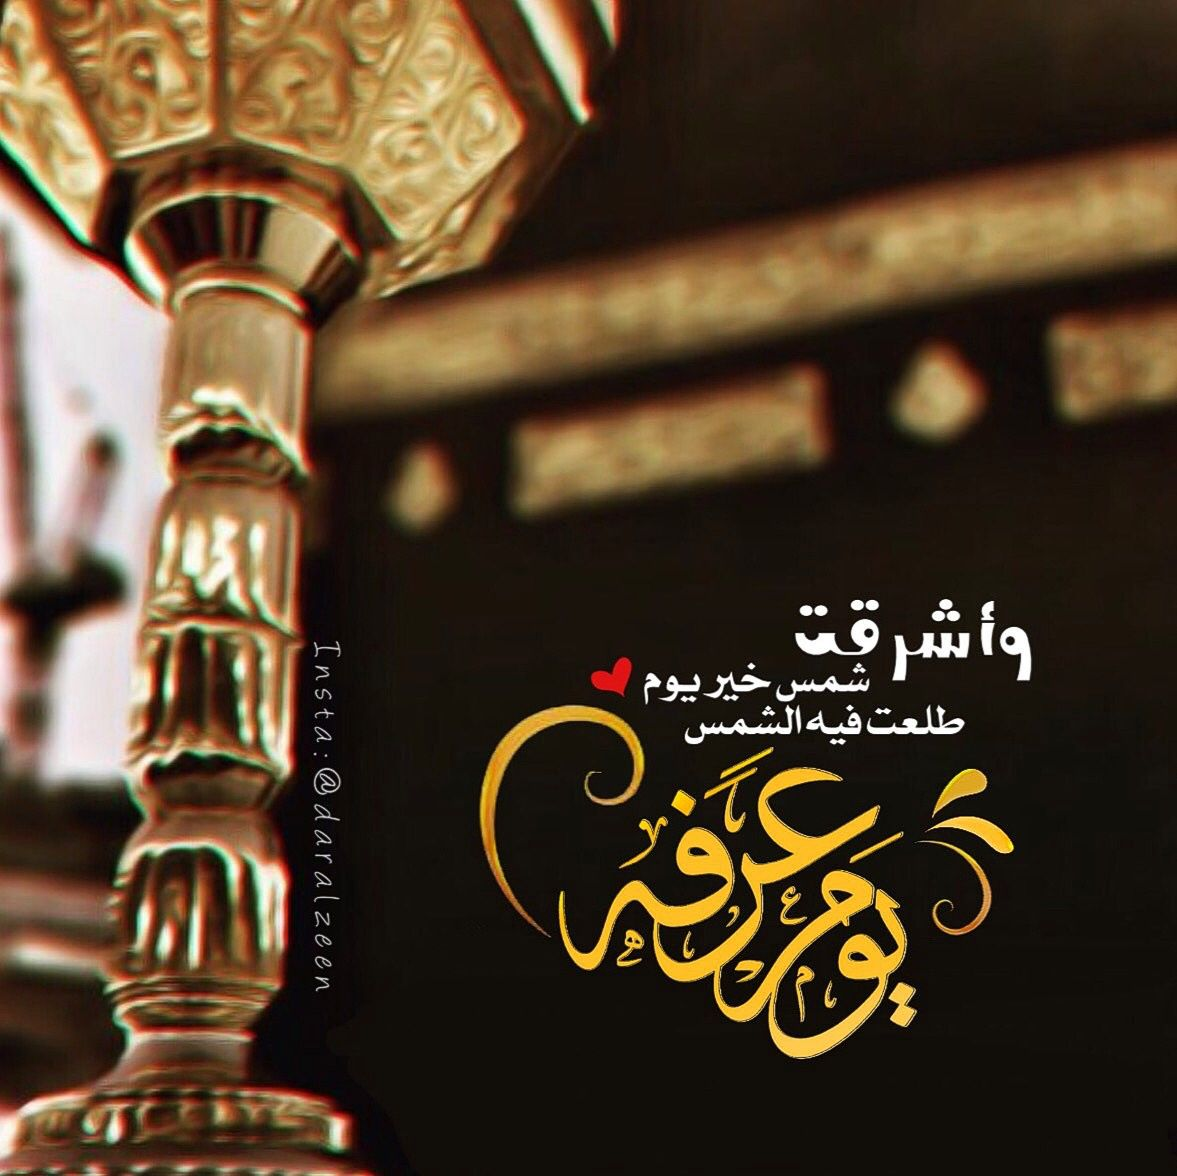 يوم عرفه Eid Images Islamic Pictures Mecca Islam